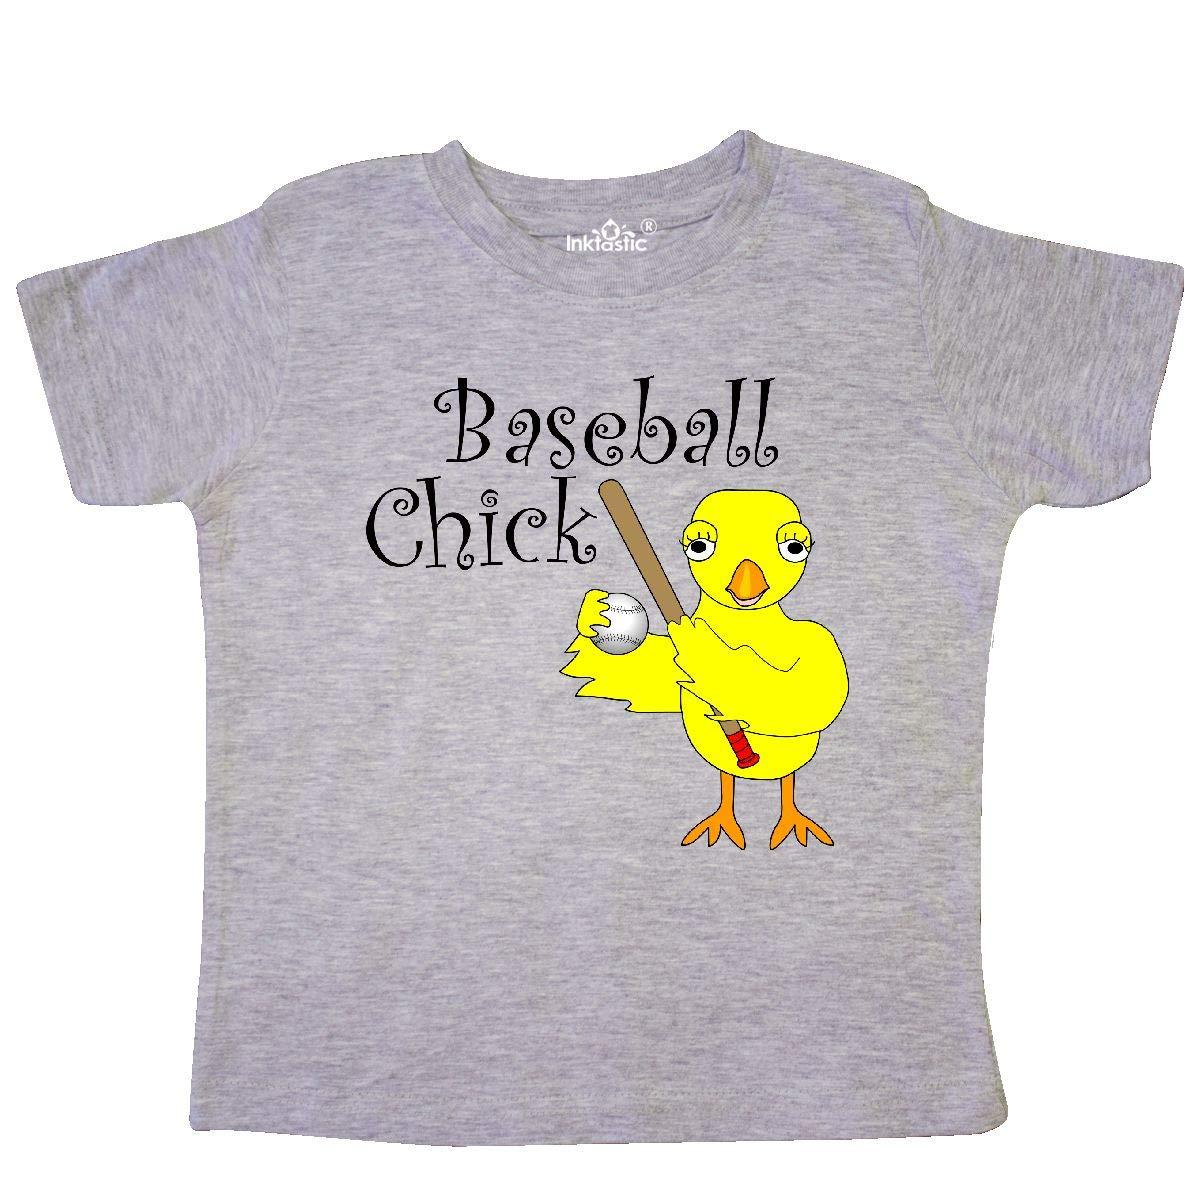 inktastic Baseball Chick Text Toddler T-Shirt